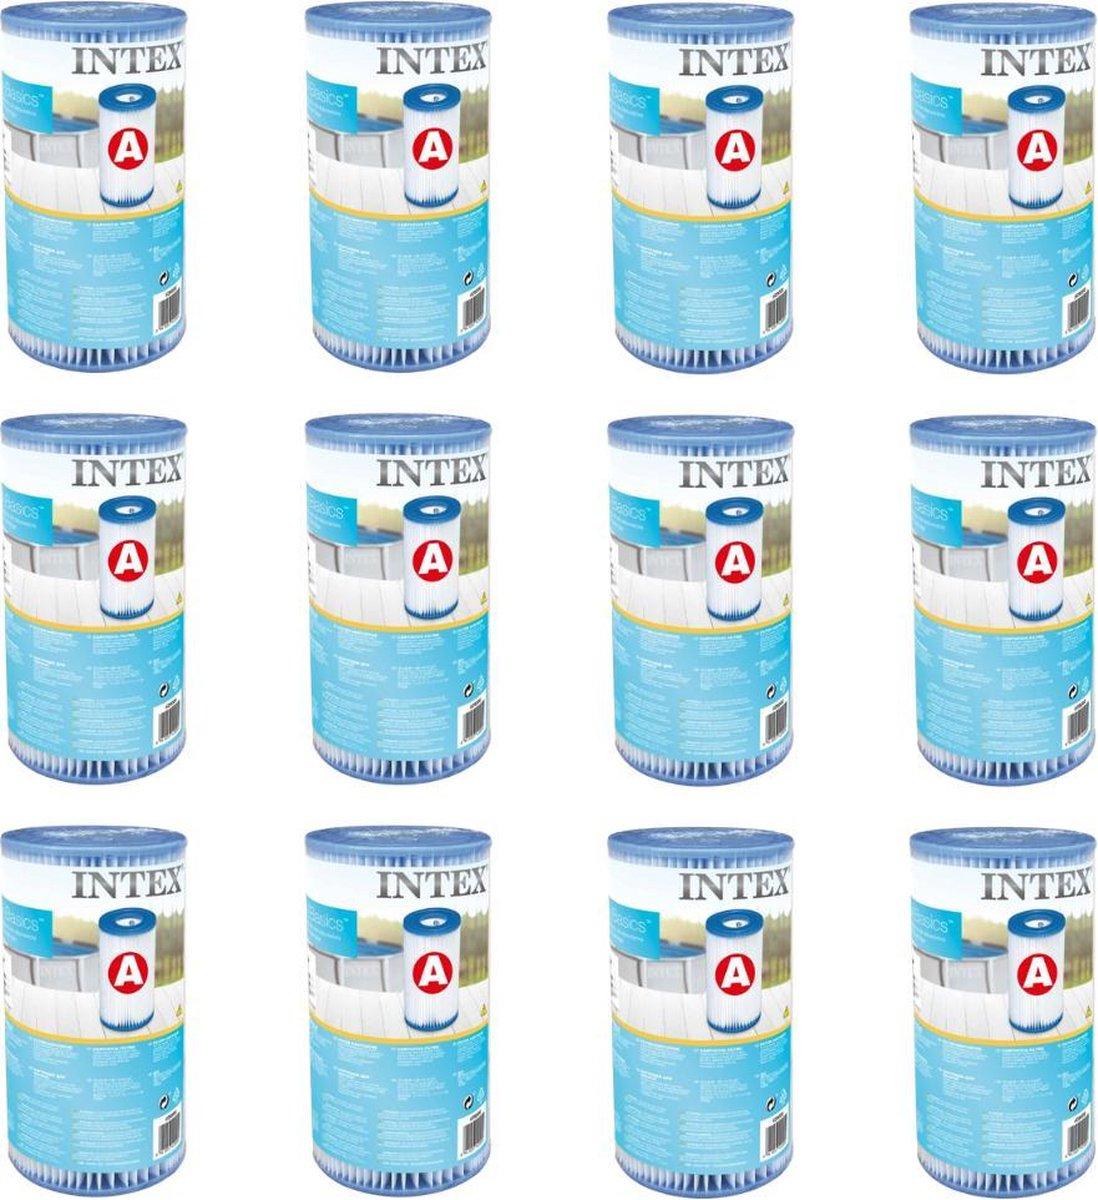 Intex Filter - A filter - 12x Zwembad Filtercartridge Type A